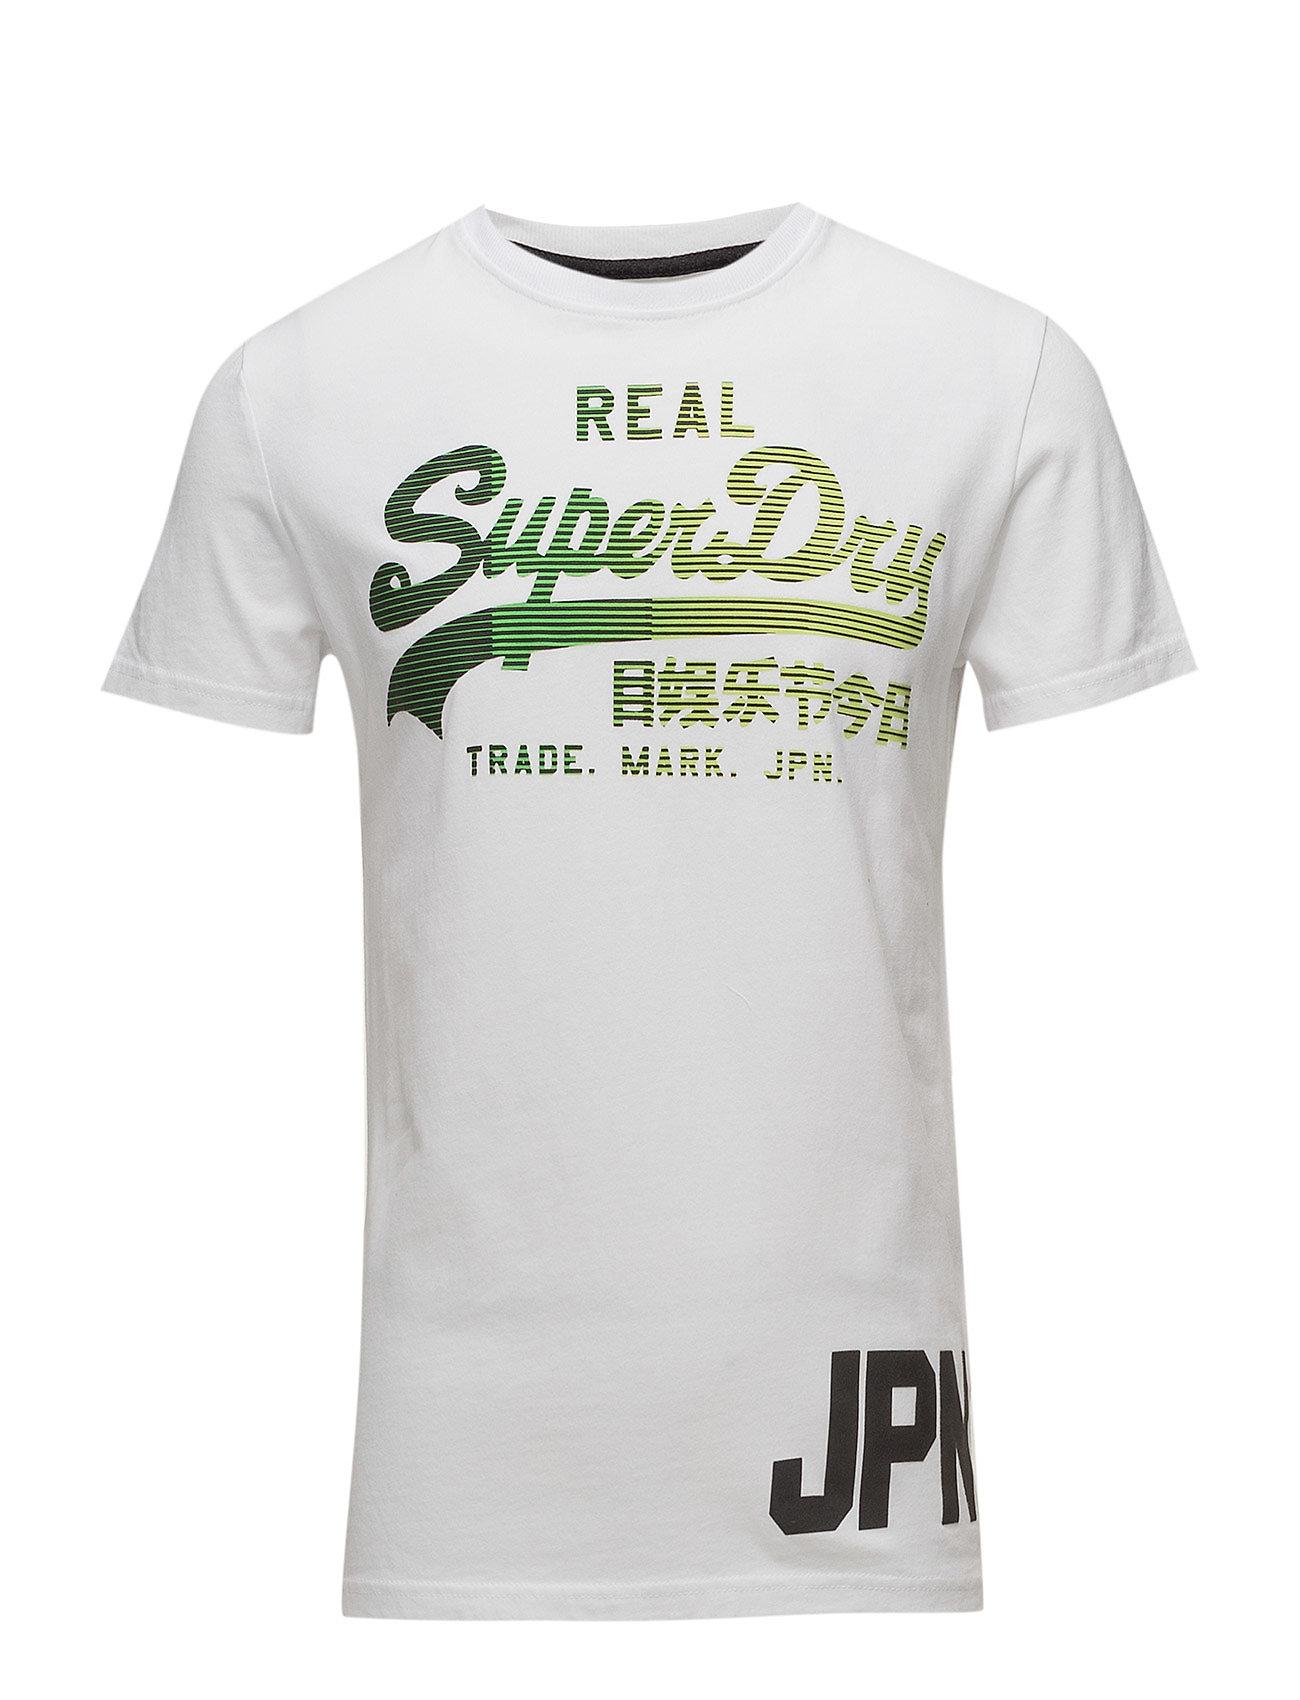 Superdry® ALE jopa -70% ⇒ Kaikki Superdry outlet tuotteet 8ad4e6eeae